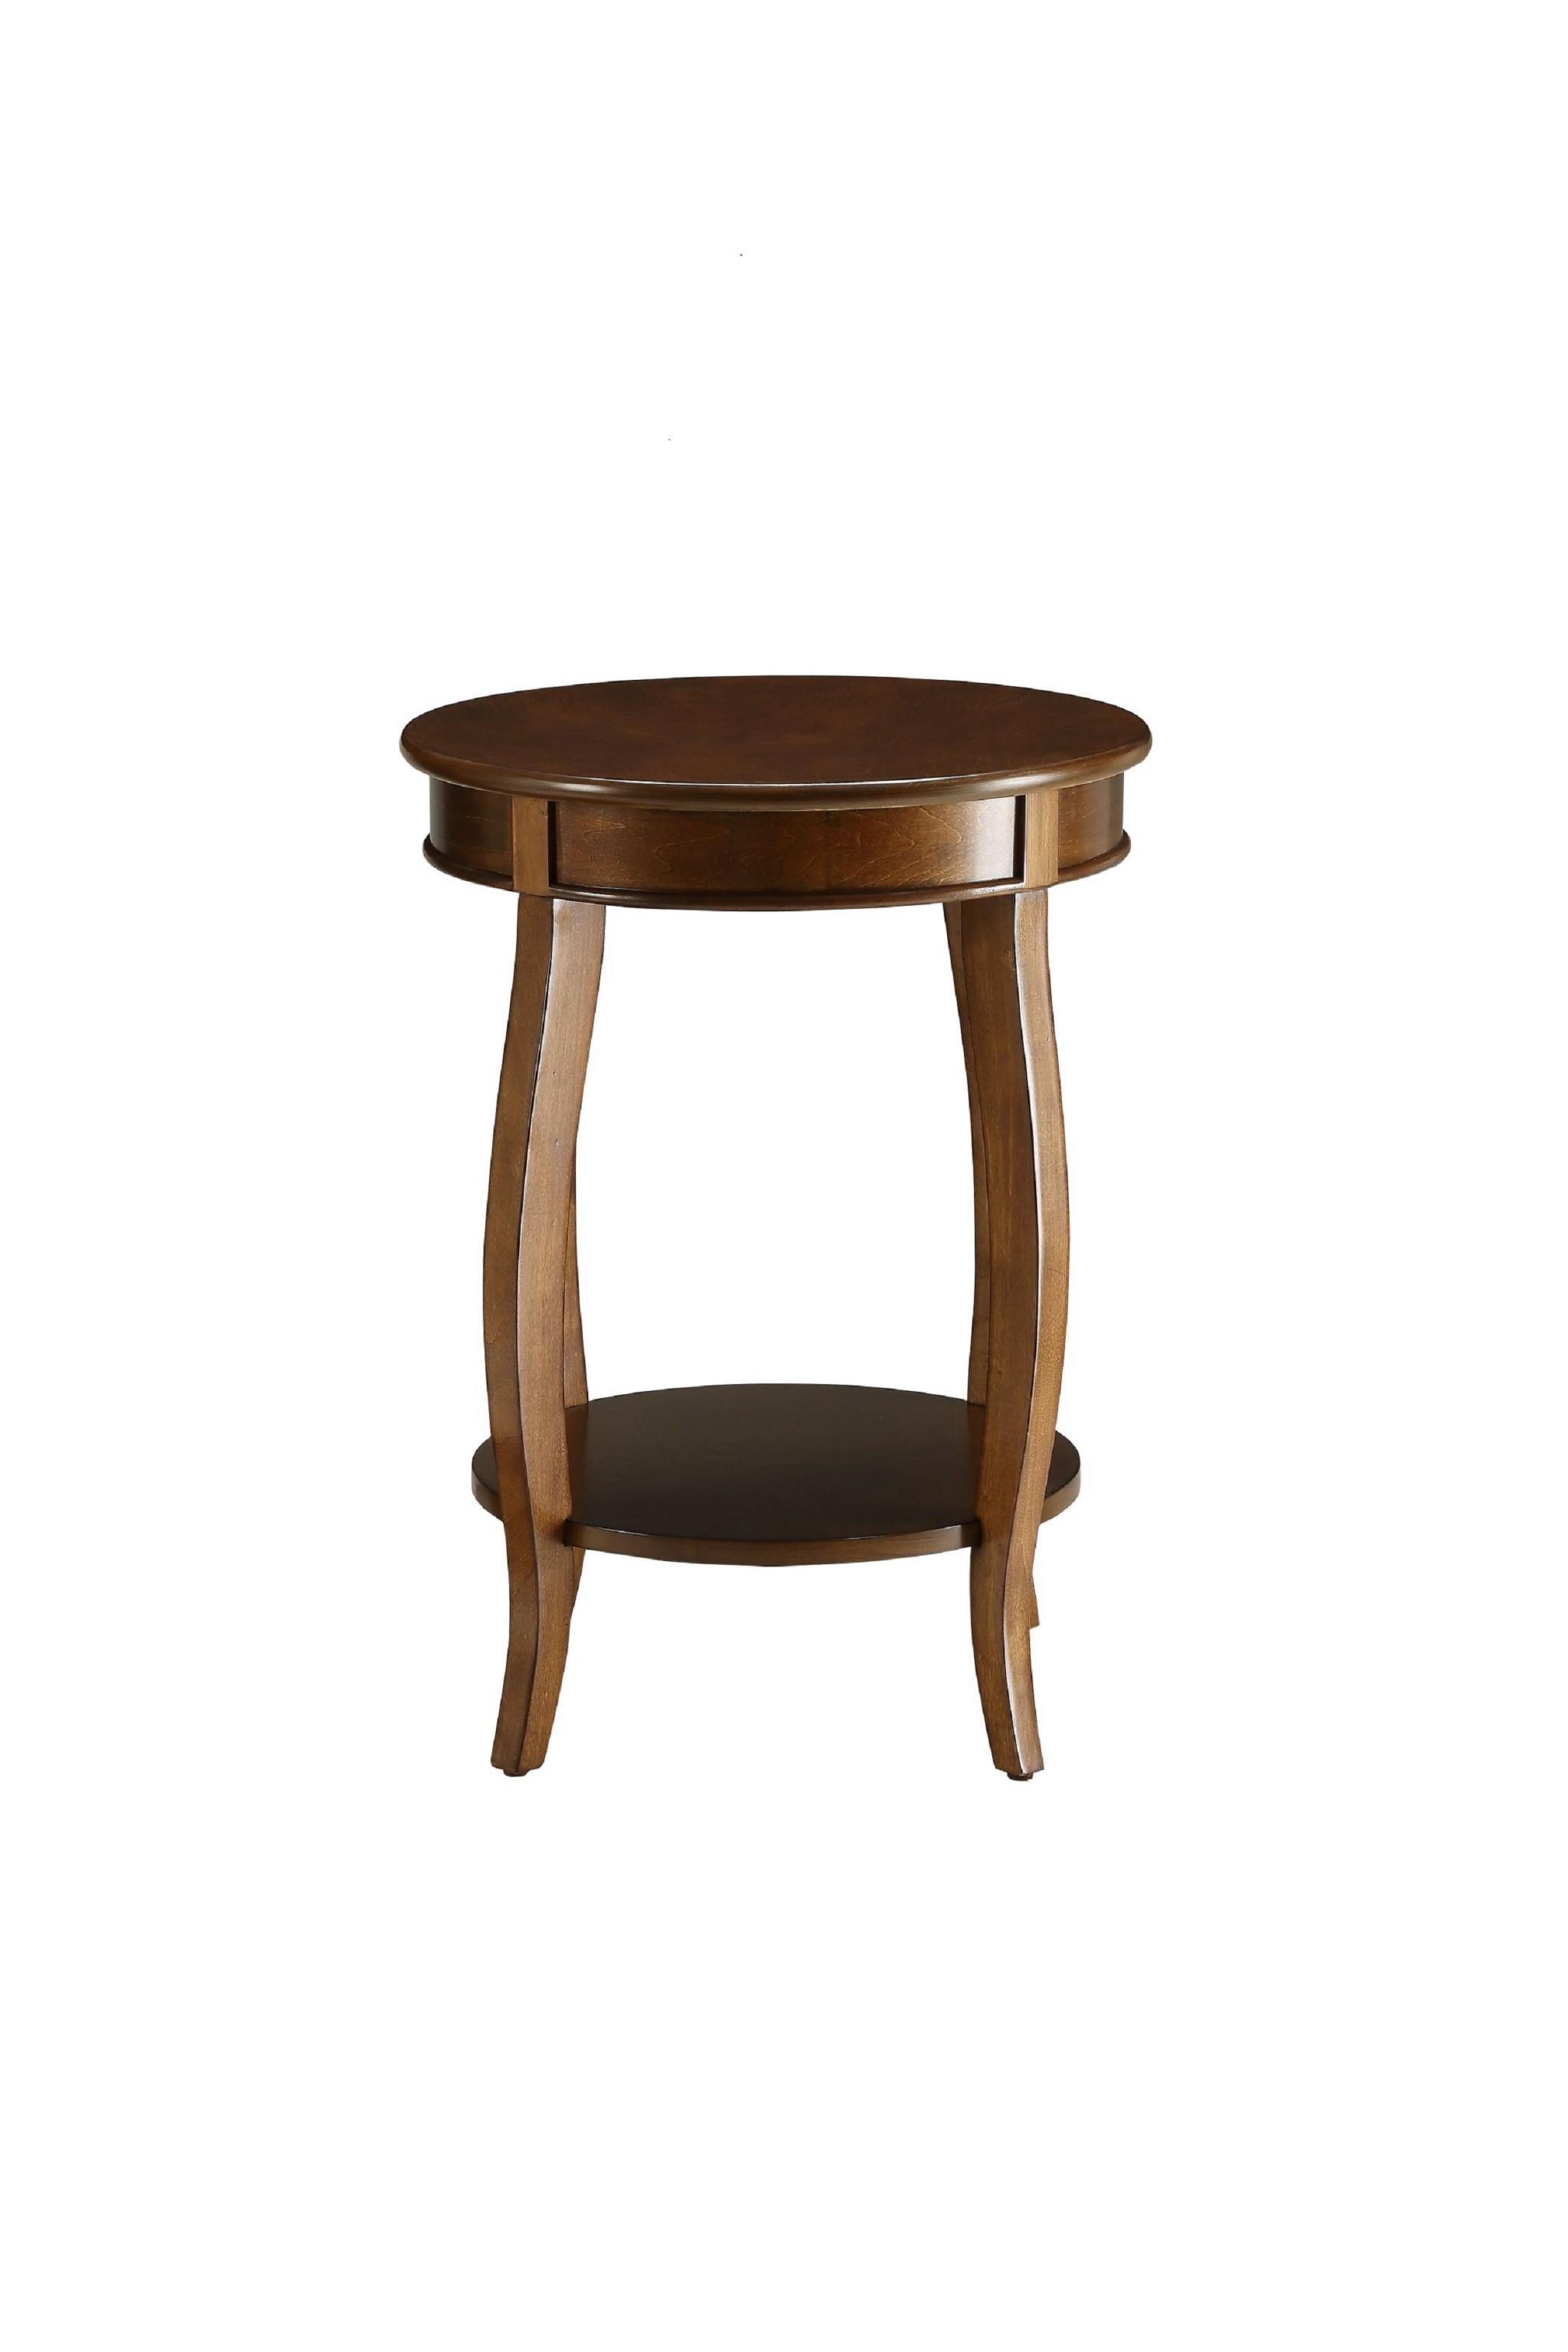 "18"" X 18"" X 24"" Walnut Solid Wood Leg Side Table"